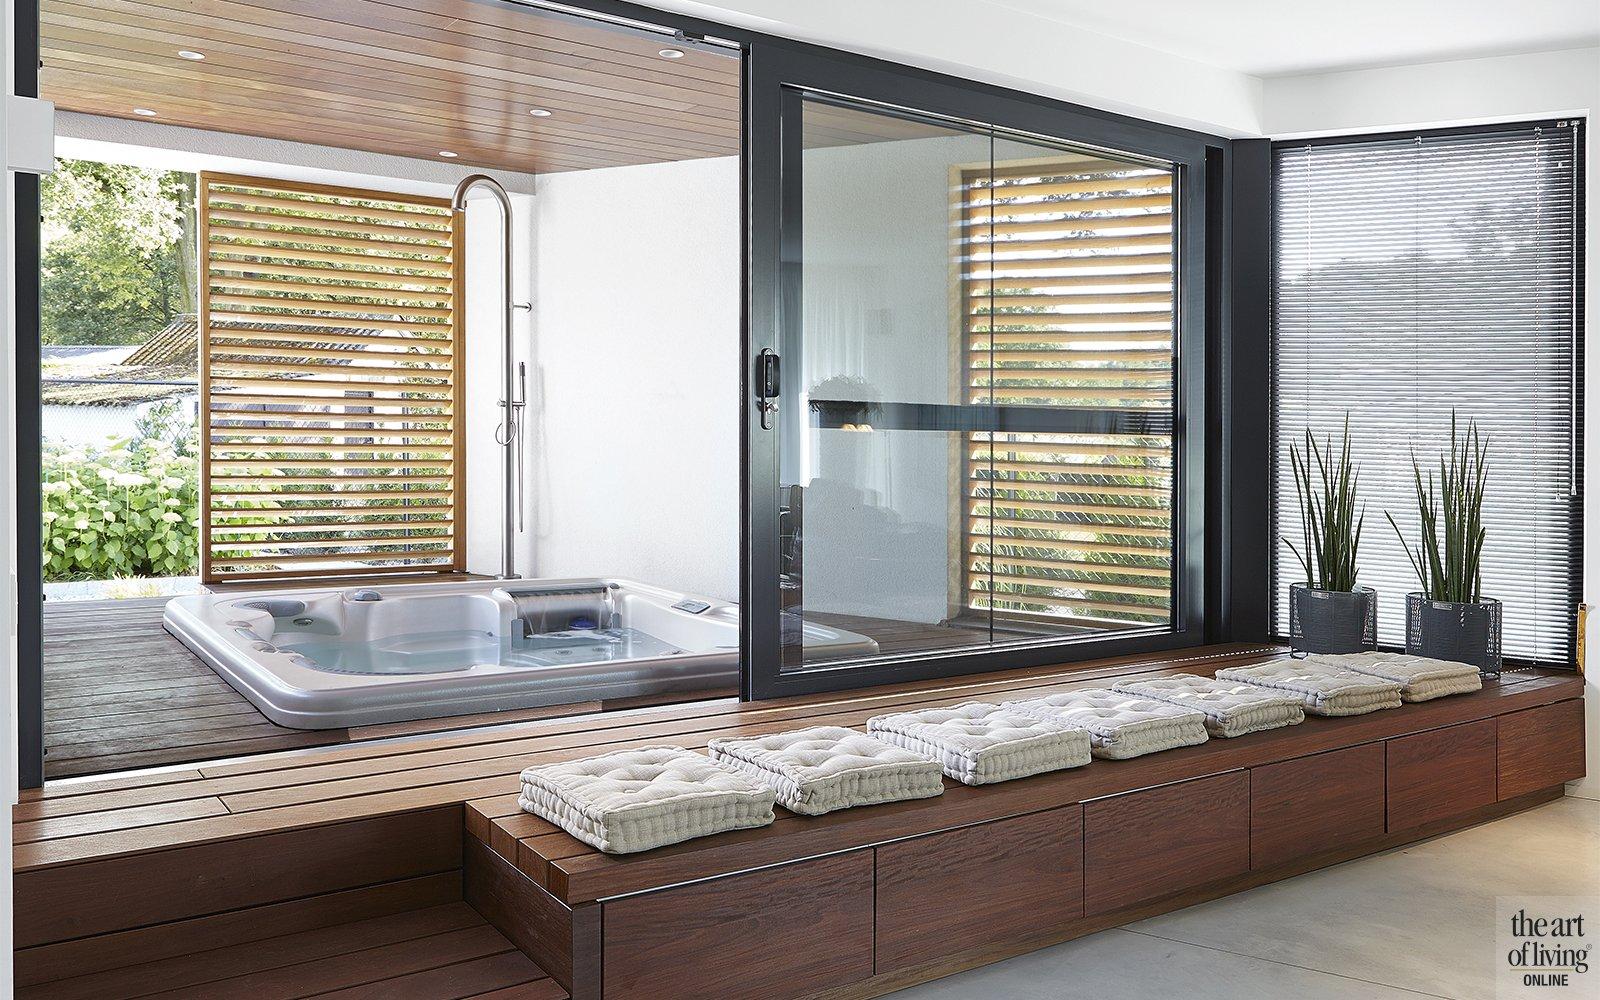 villa vol verassiingen, dia architecten, the art of living